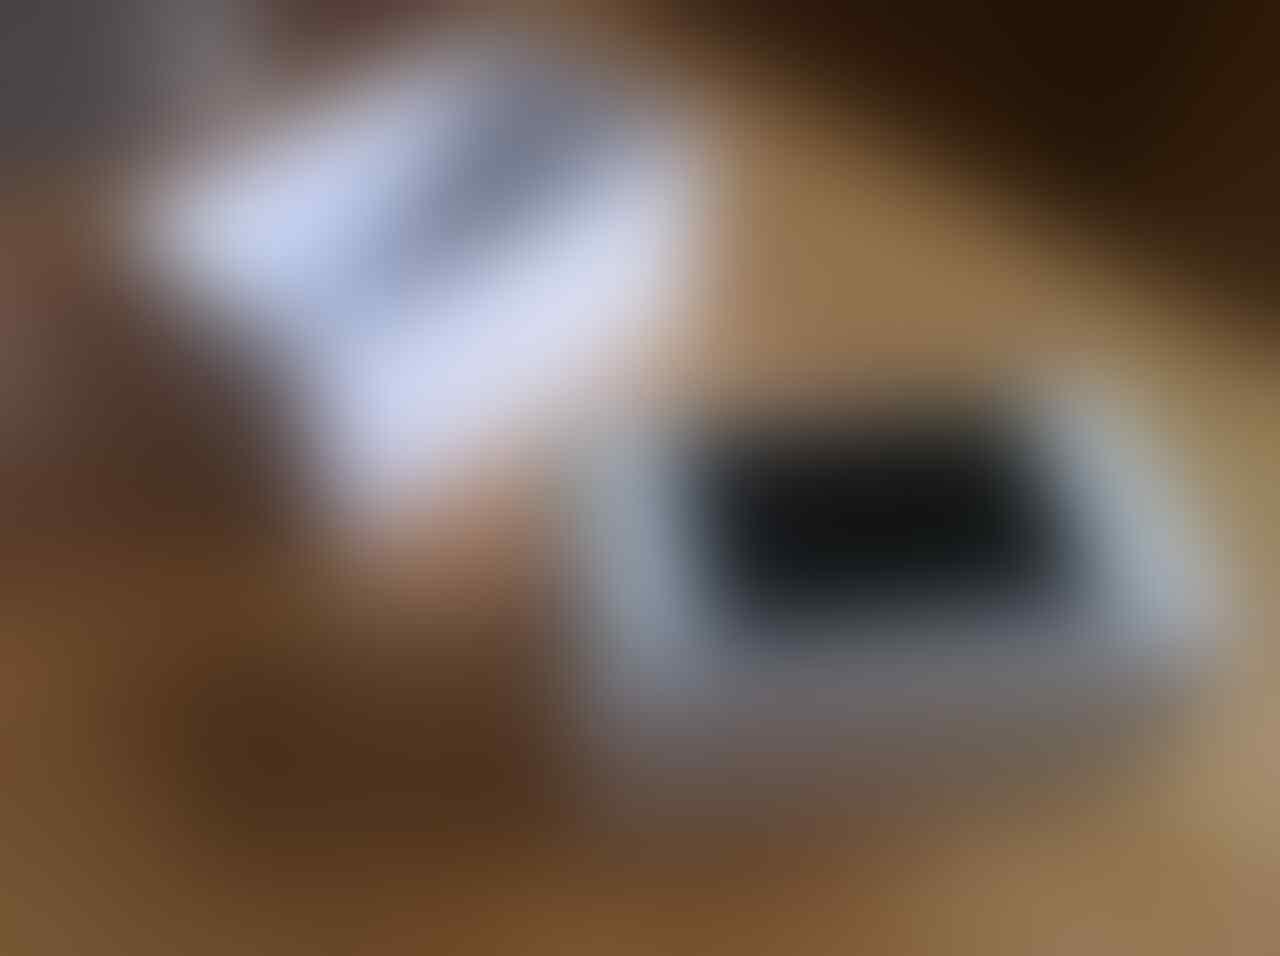 DI JUAL IPHONE 5 16GB BARU & BERSEGEL Rp.1.500.000.- :INFO;HUB;085932872555